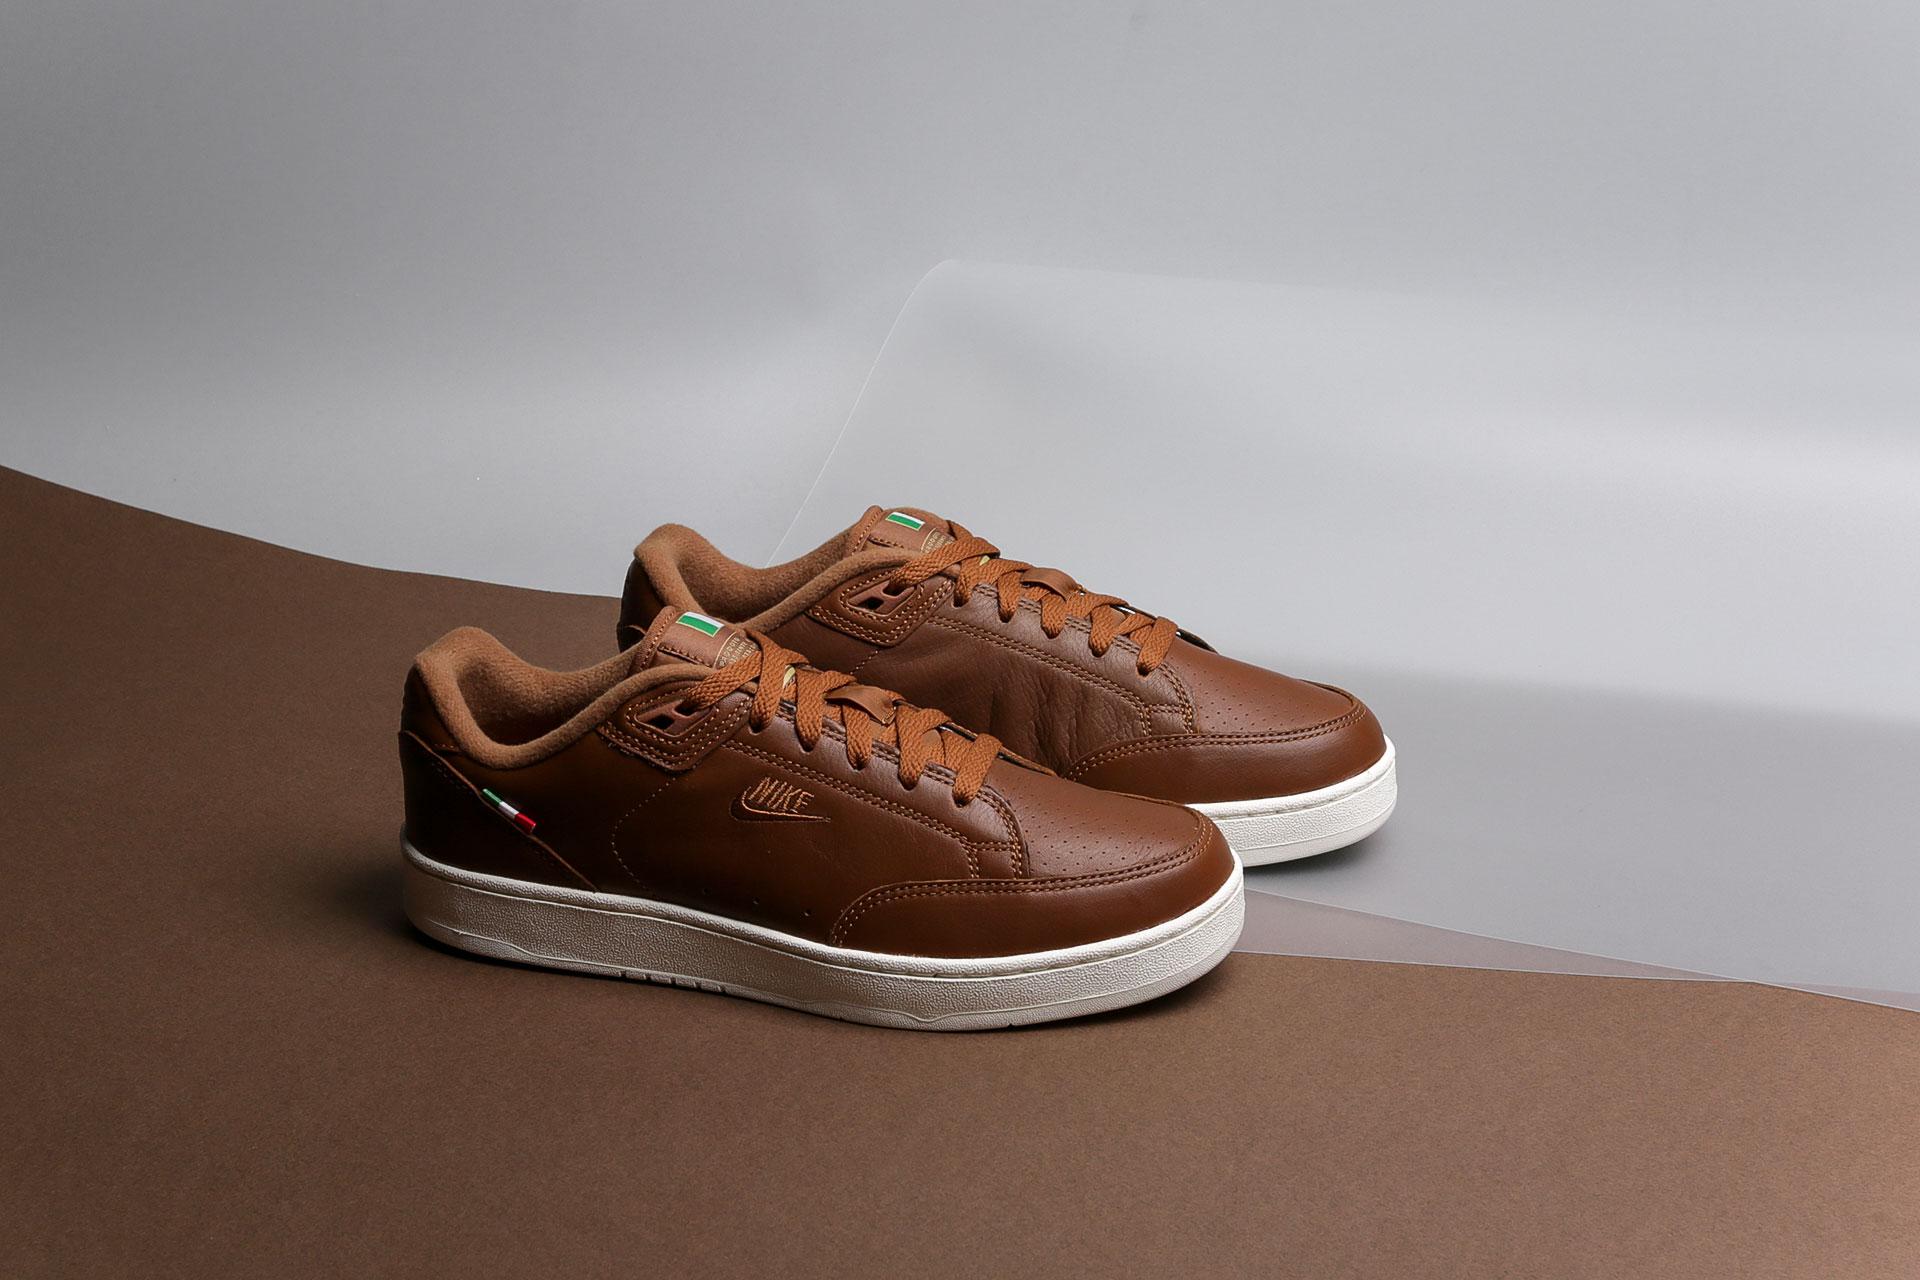 5379933e Купить коричневые мужские кроссовки Grandstand II Pinnacle от Nike ...